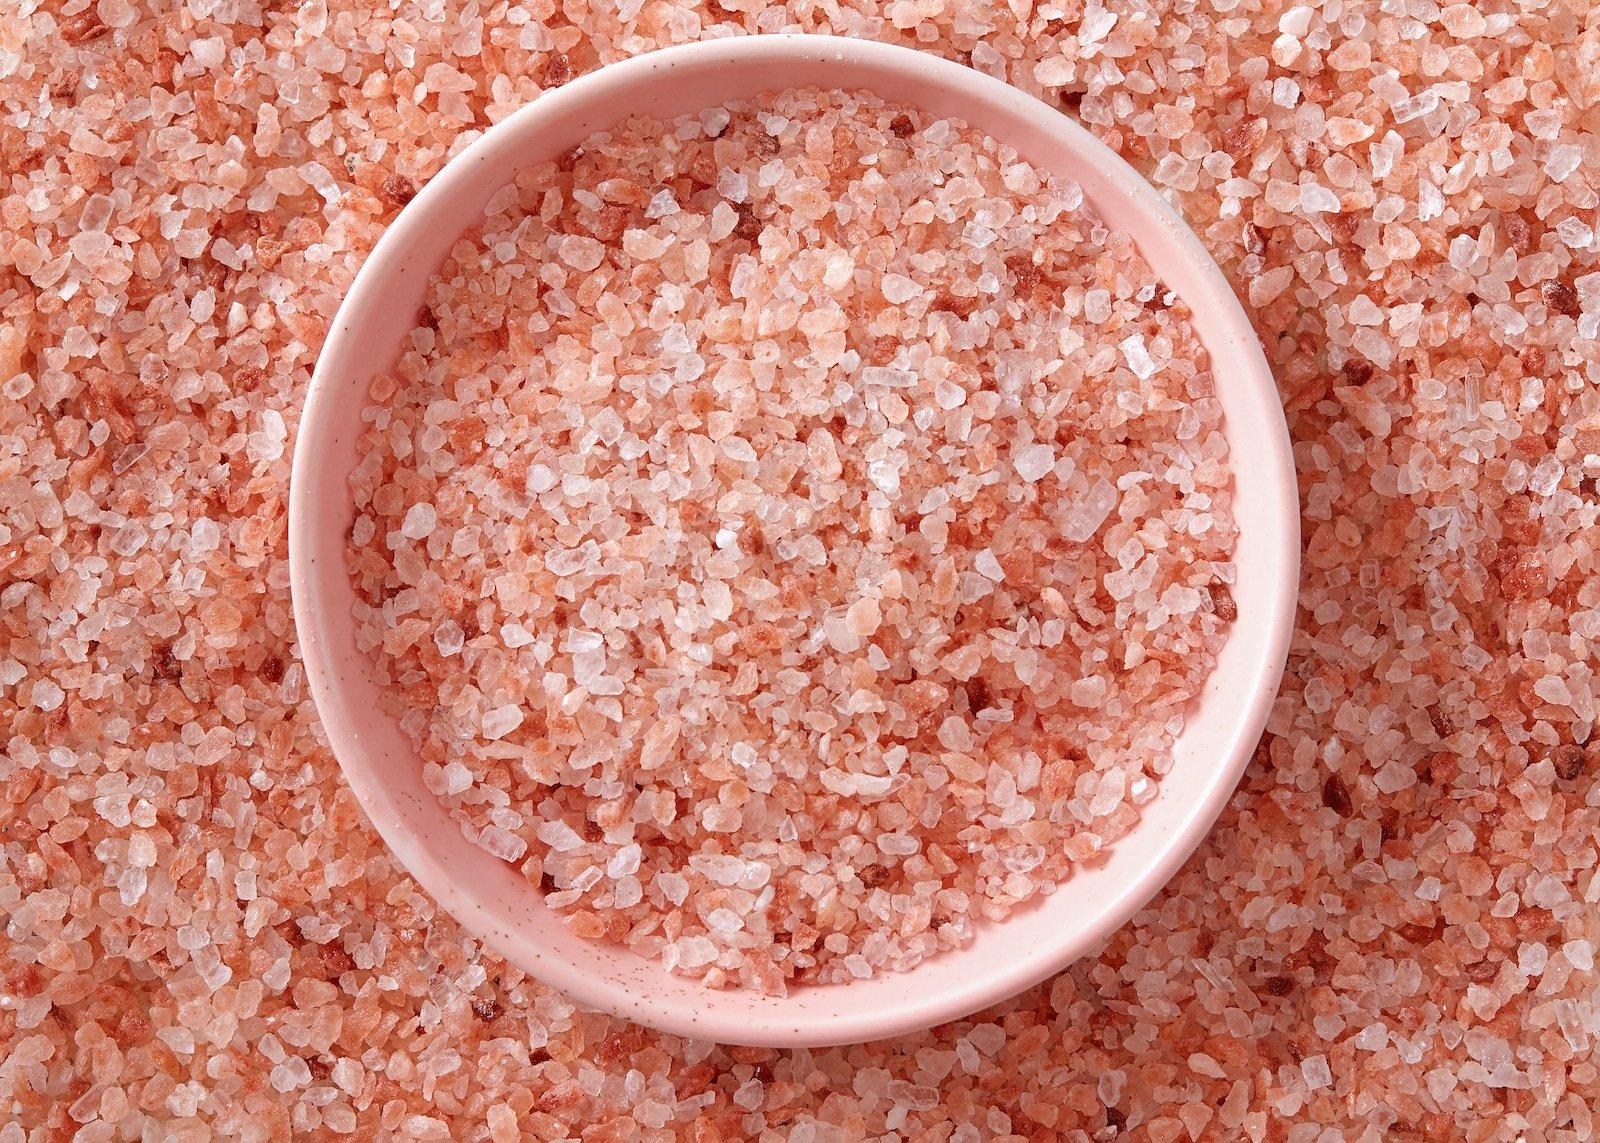 Kosher Salt Vs. Himalayan Salt: SPICEography Showdown